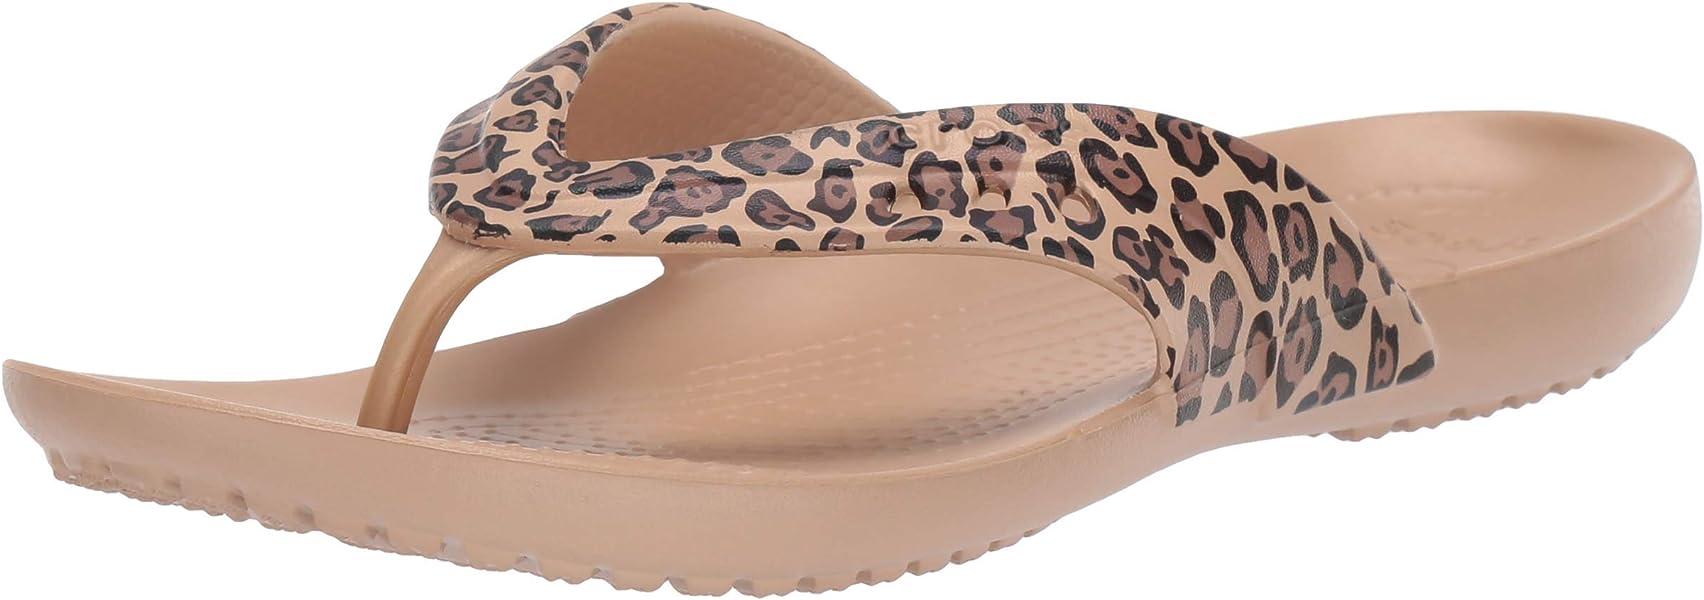 562d43535 Crocs Women s Kadee Leopard Print Flip-Flop